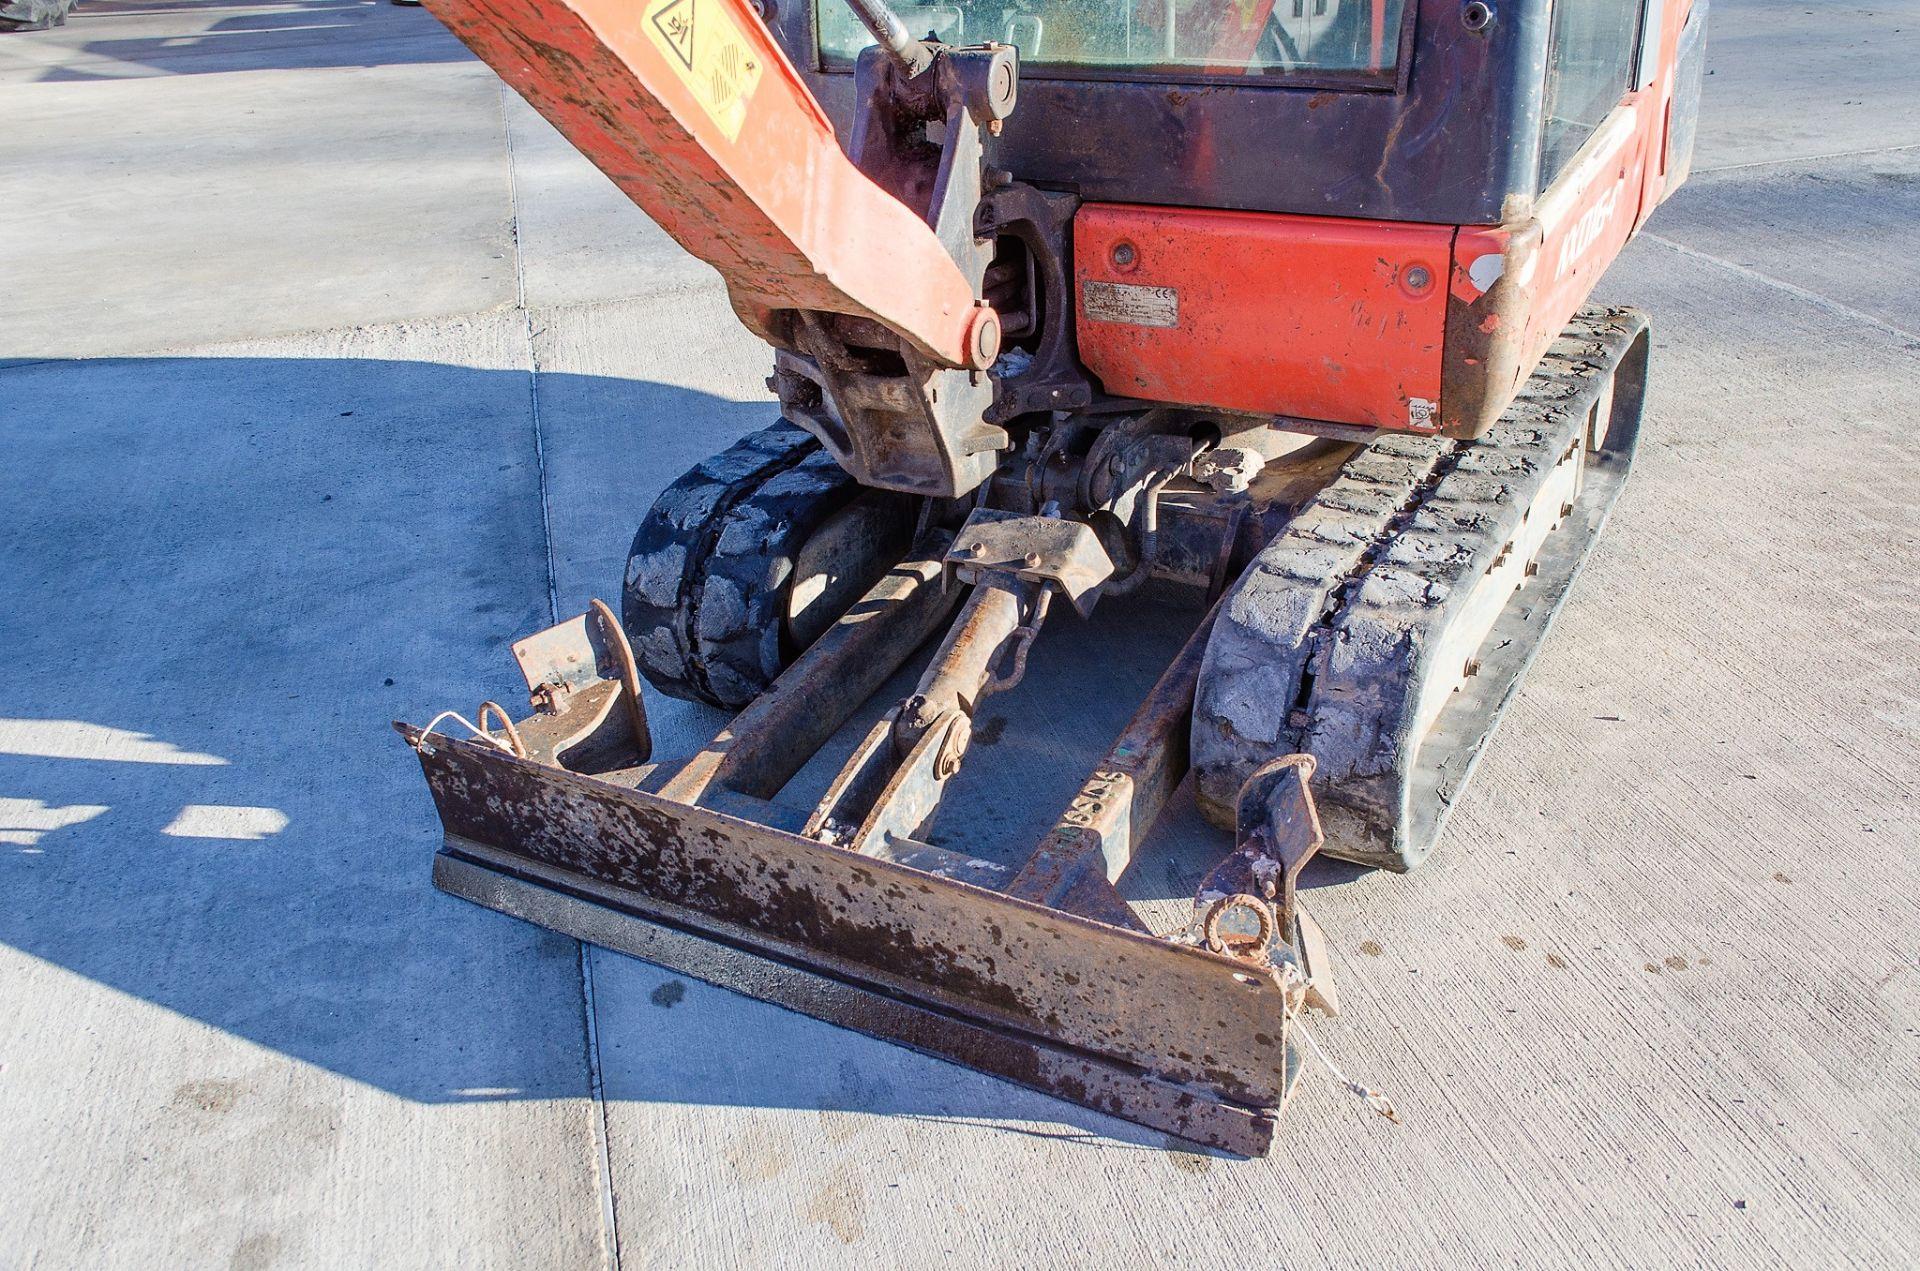 Kubota KX016-4 1.5 tonne rubber tracked mini excavator Year: 2015 S/N: 58688 Recorded Hours: 1736 - Image 11 of 19